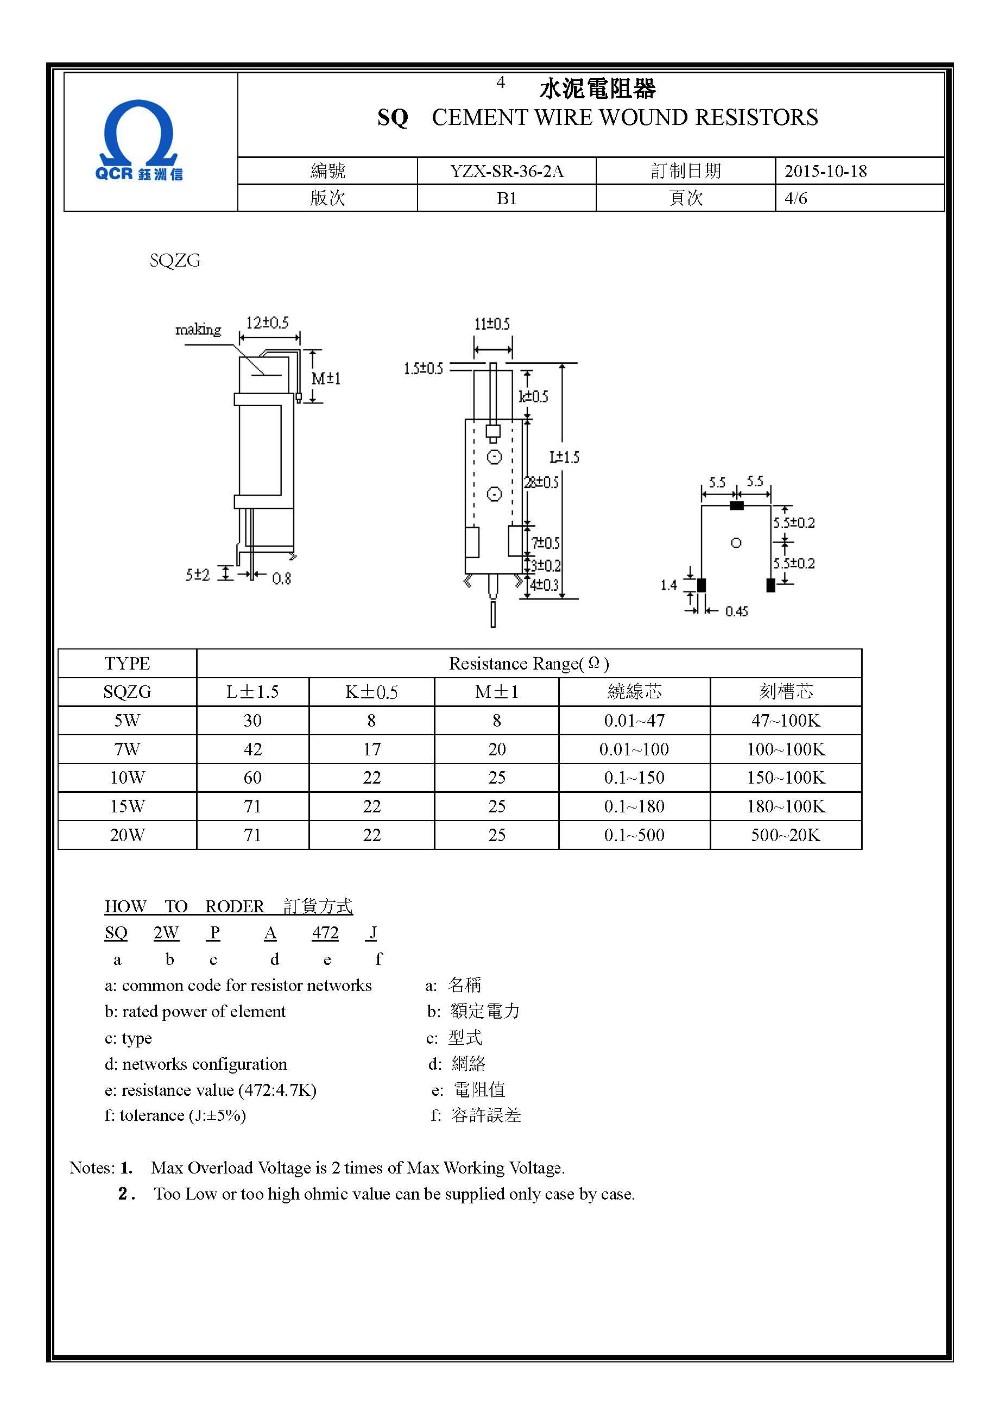 medium resolution of qcr thermal fuse cement resisrots sqp 50w power amplifier acoustics